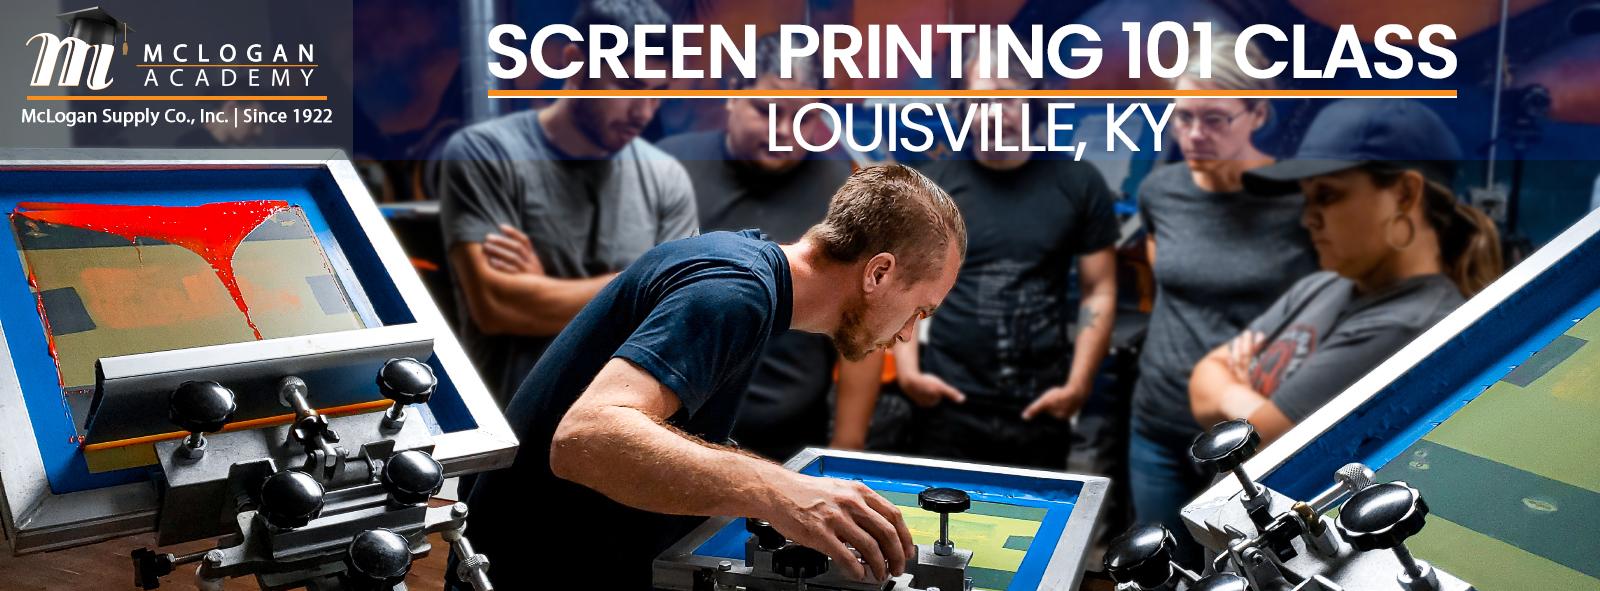 Screen printing class Louisville KY